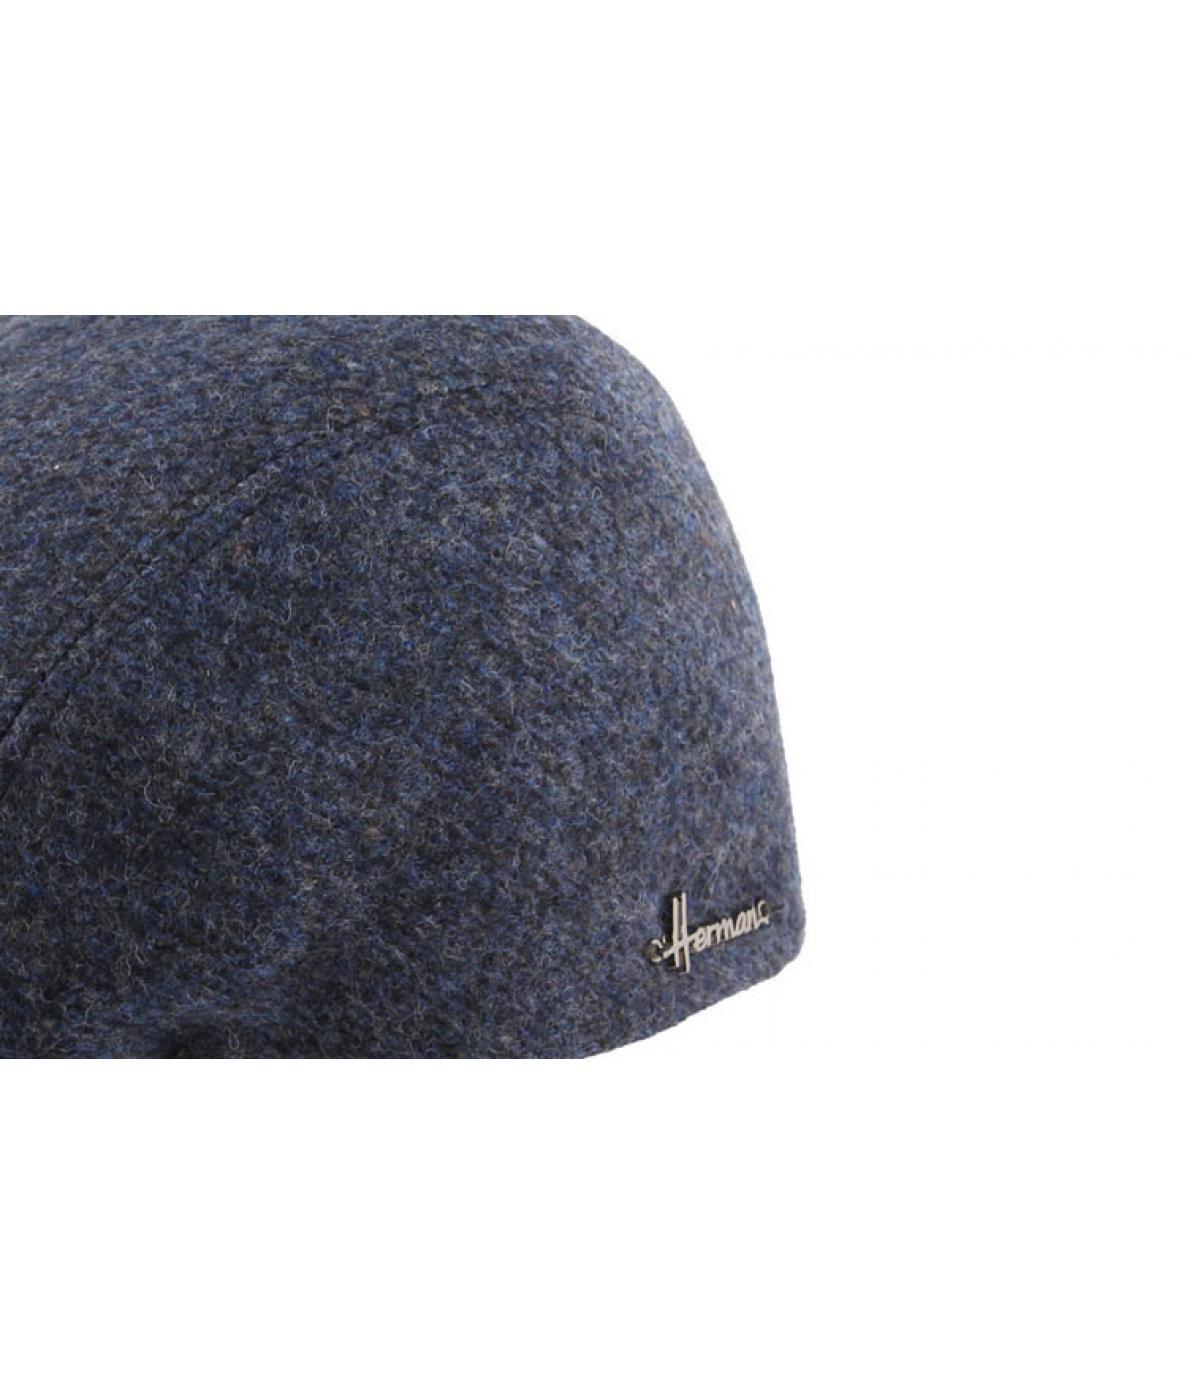 Details Range wool EF blue - afbeeling 3